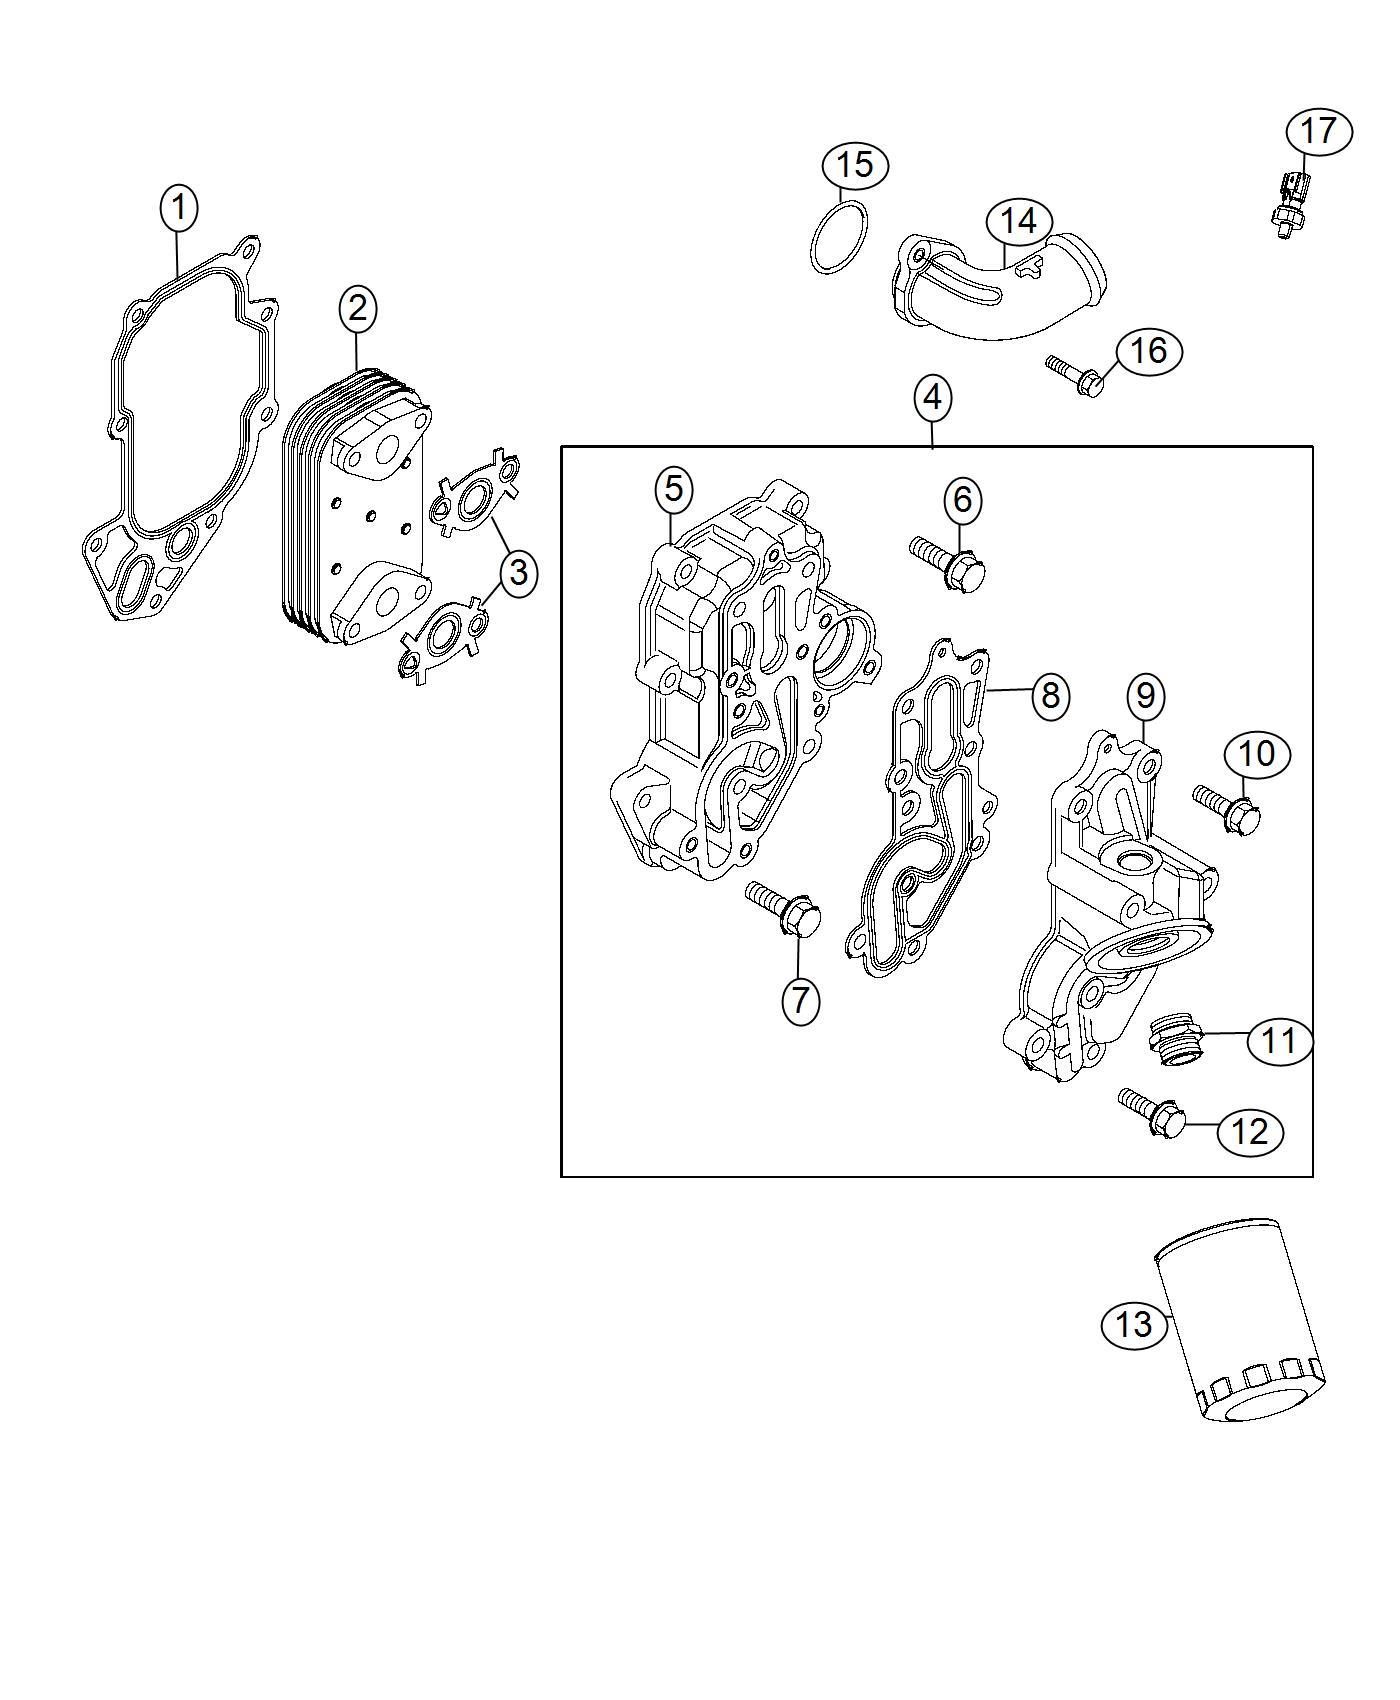 Dodge Ram Connector 02 St Enginesel